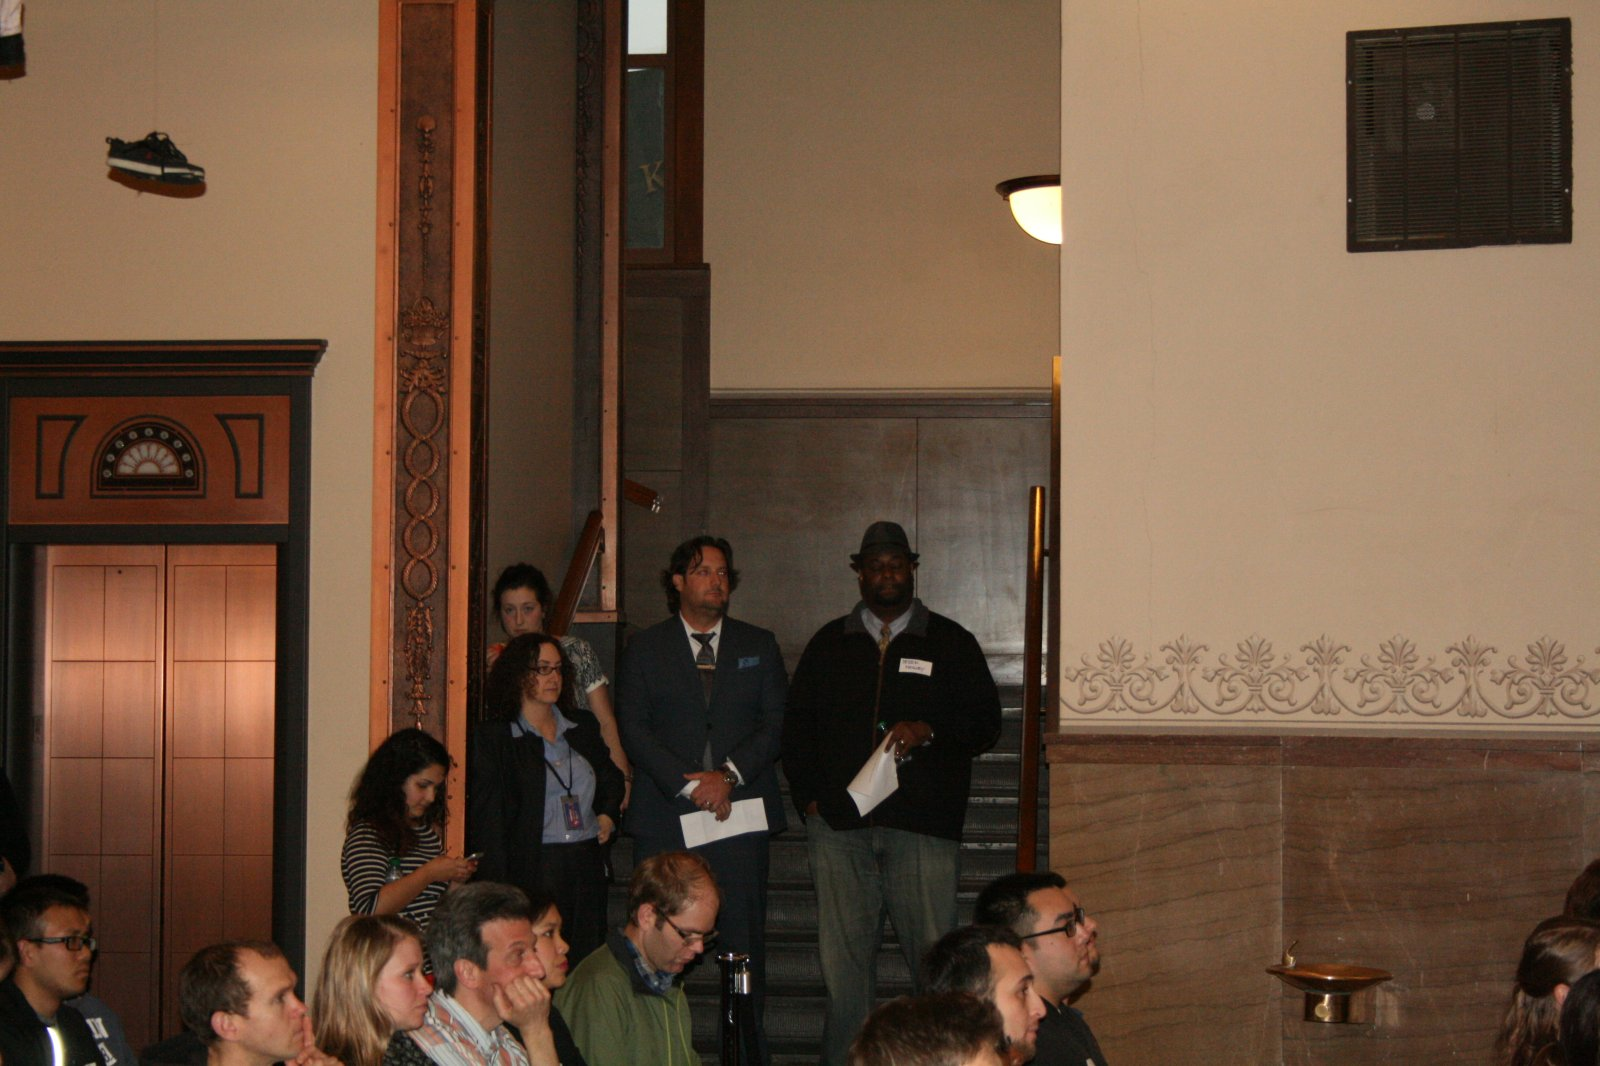 Jodie Tabak, Rick Barrett, and Judge Derek Mosley